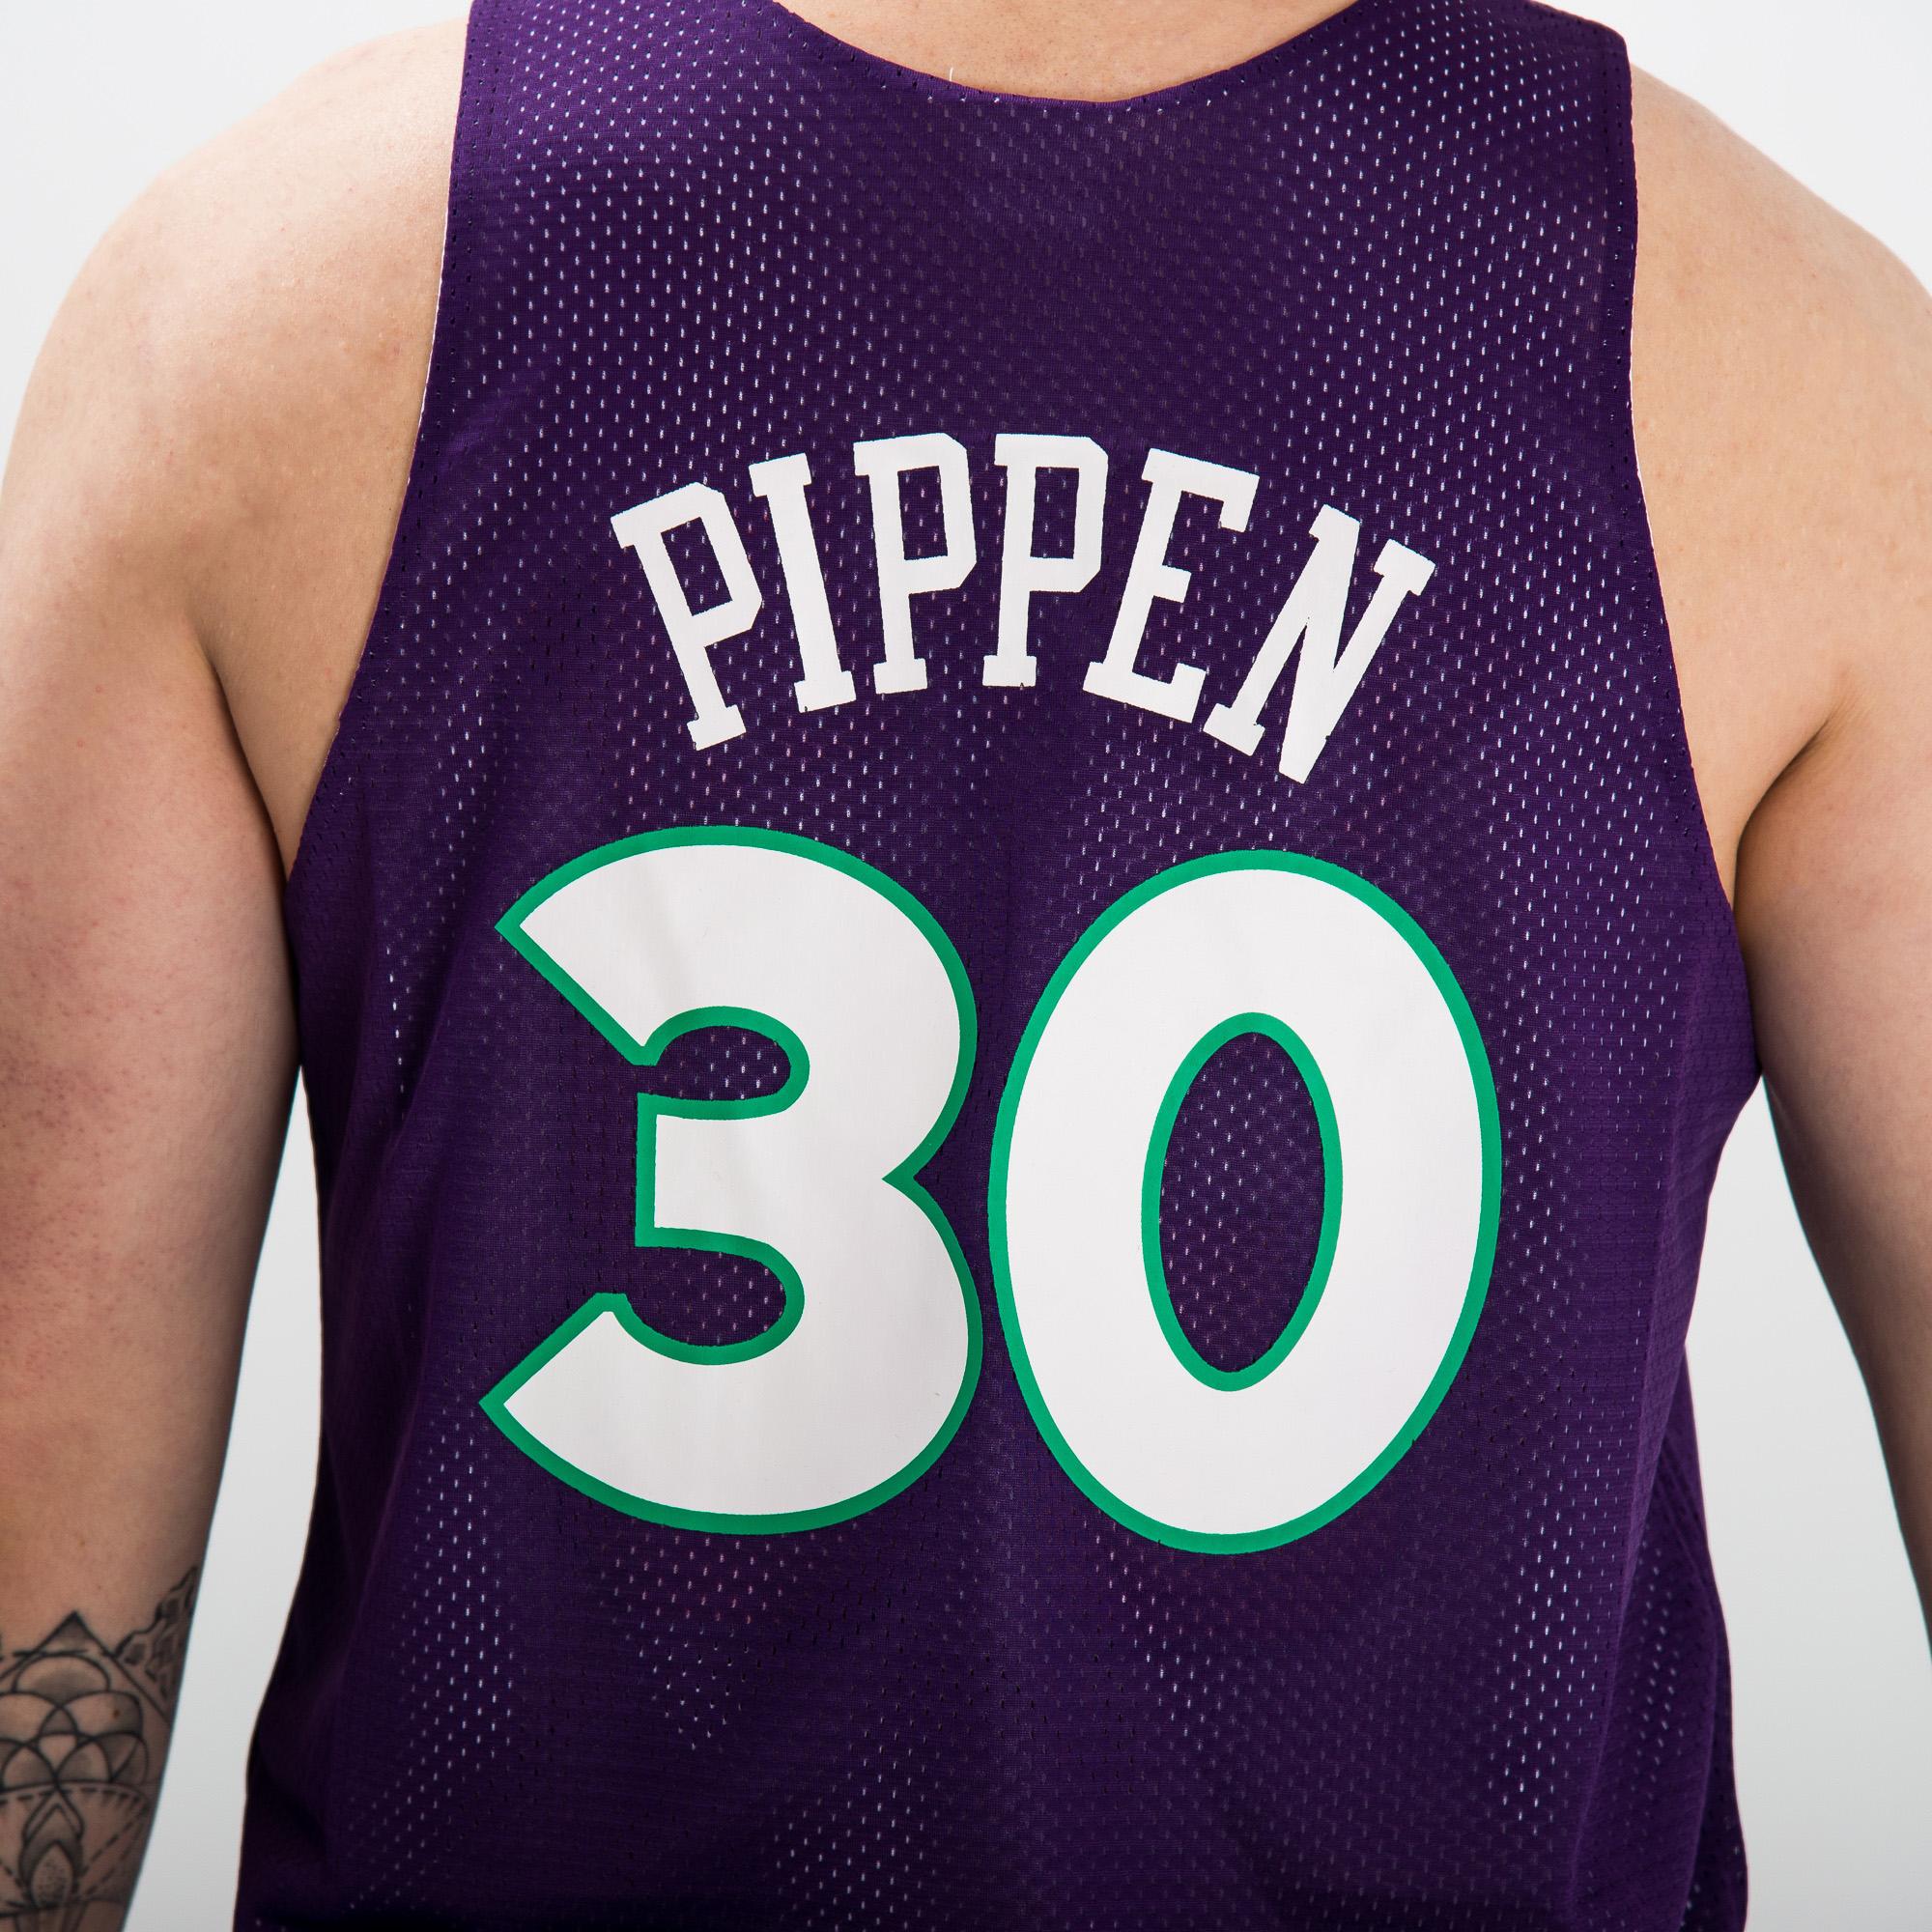 2a223dac1c18d Mitchell   Ness NBA Chicago Bulls-All-Star 1995 Scottie Pippen Reversible  Mesh Tank